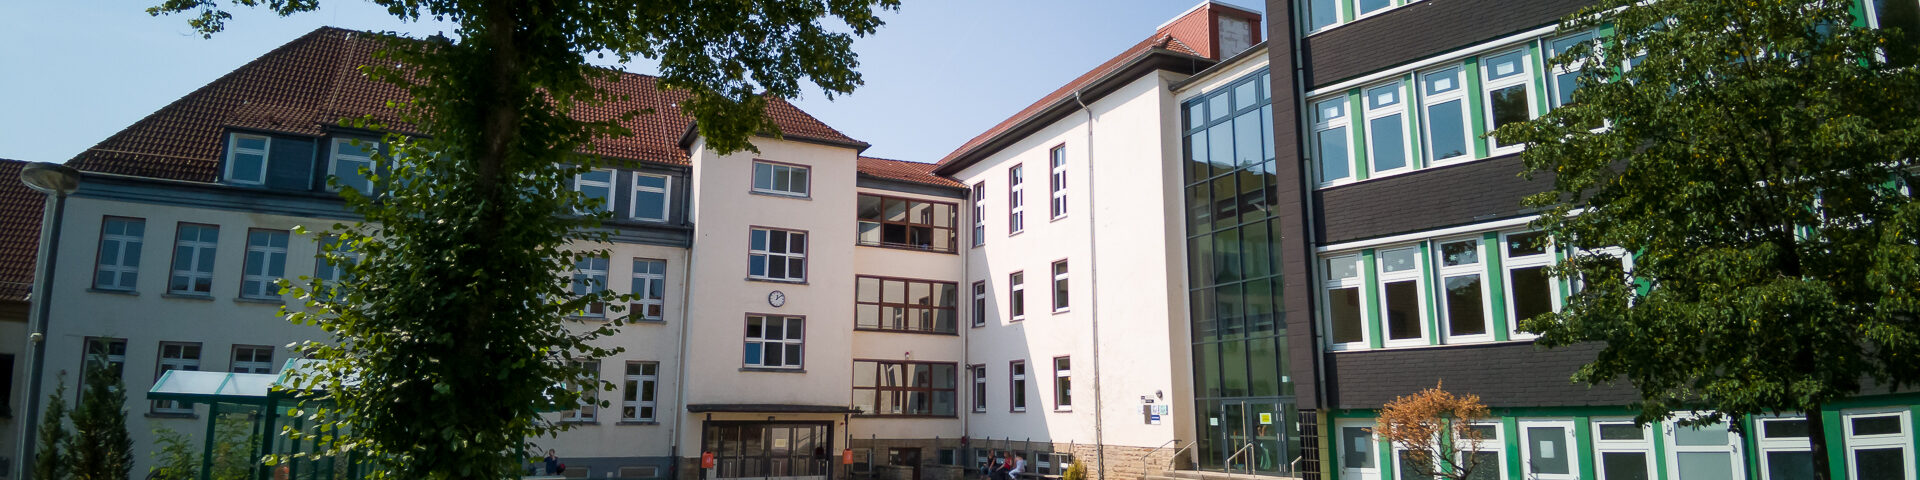 Sekundarschule Ennepetal